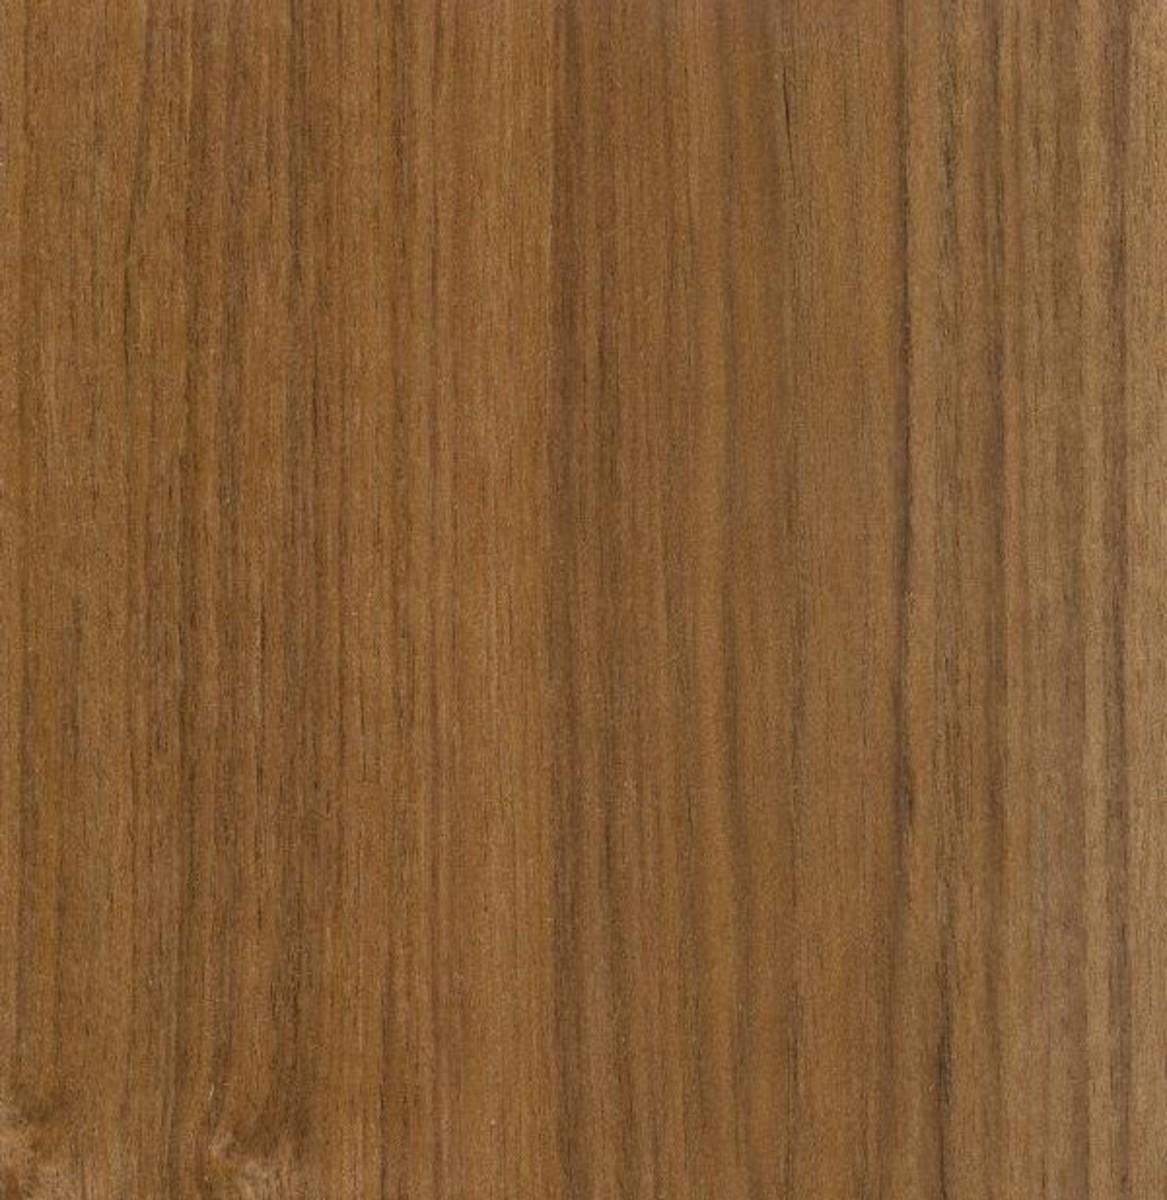 How To Identify Teak Wood Furniture Solid Wood Furniture